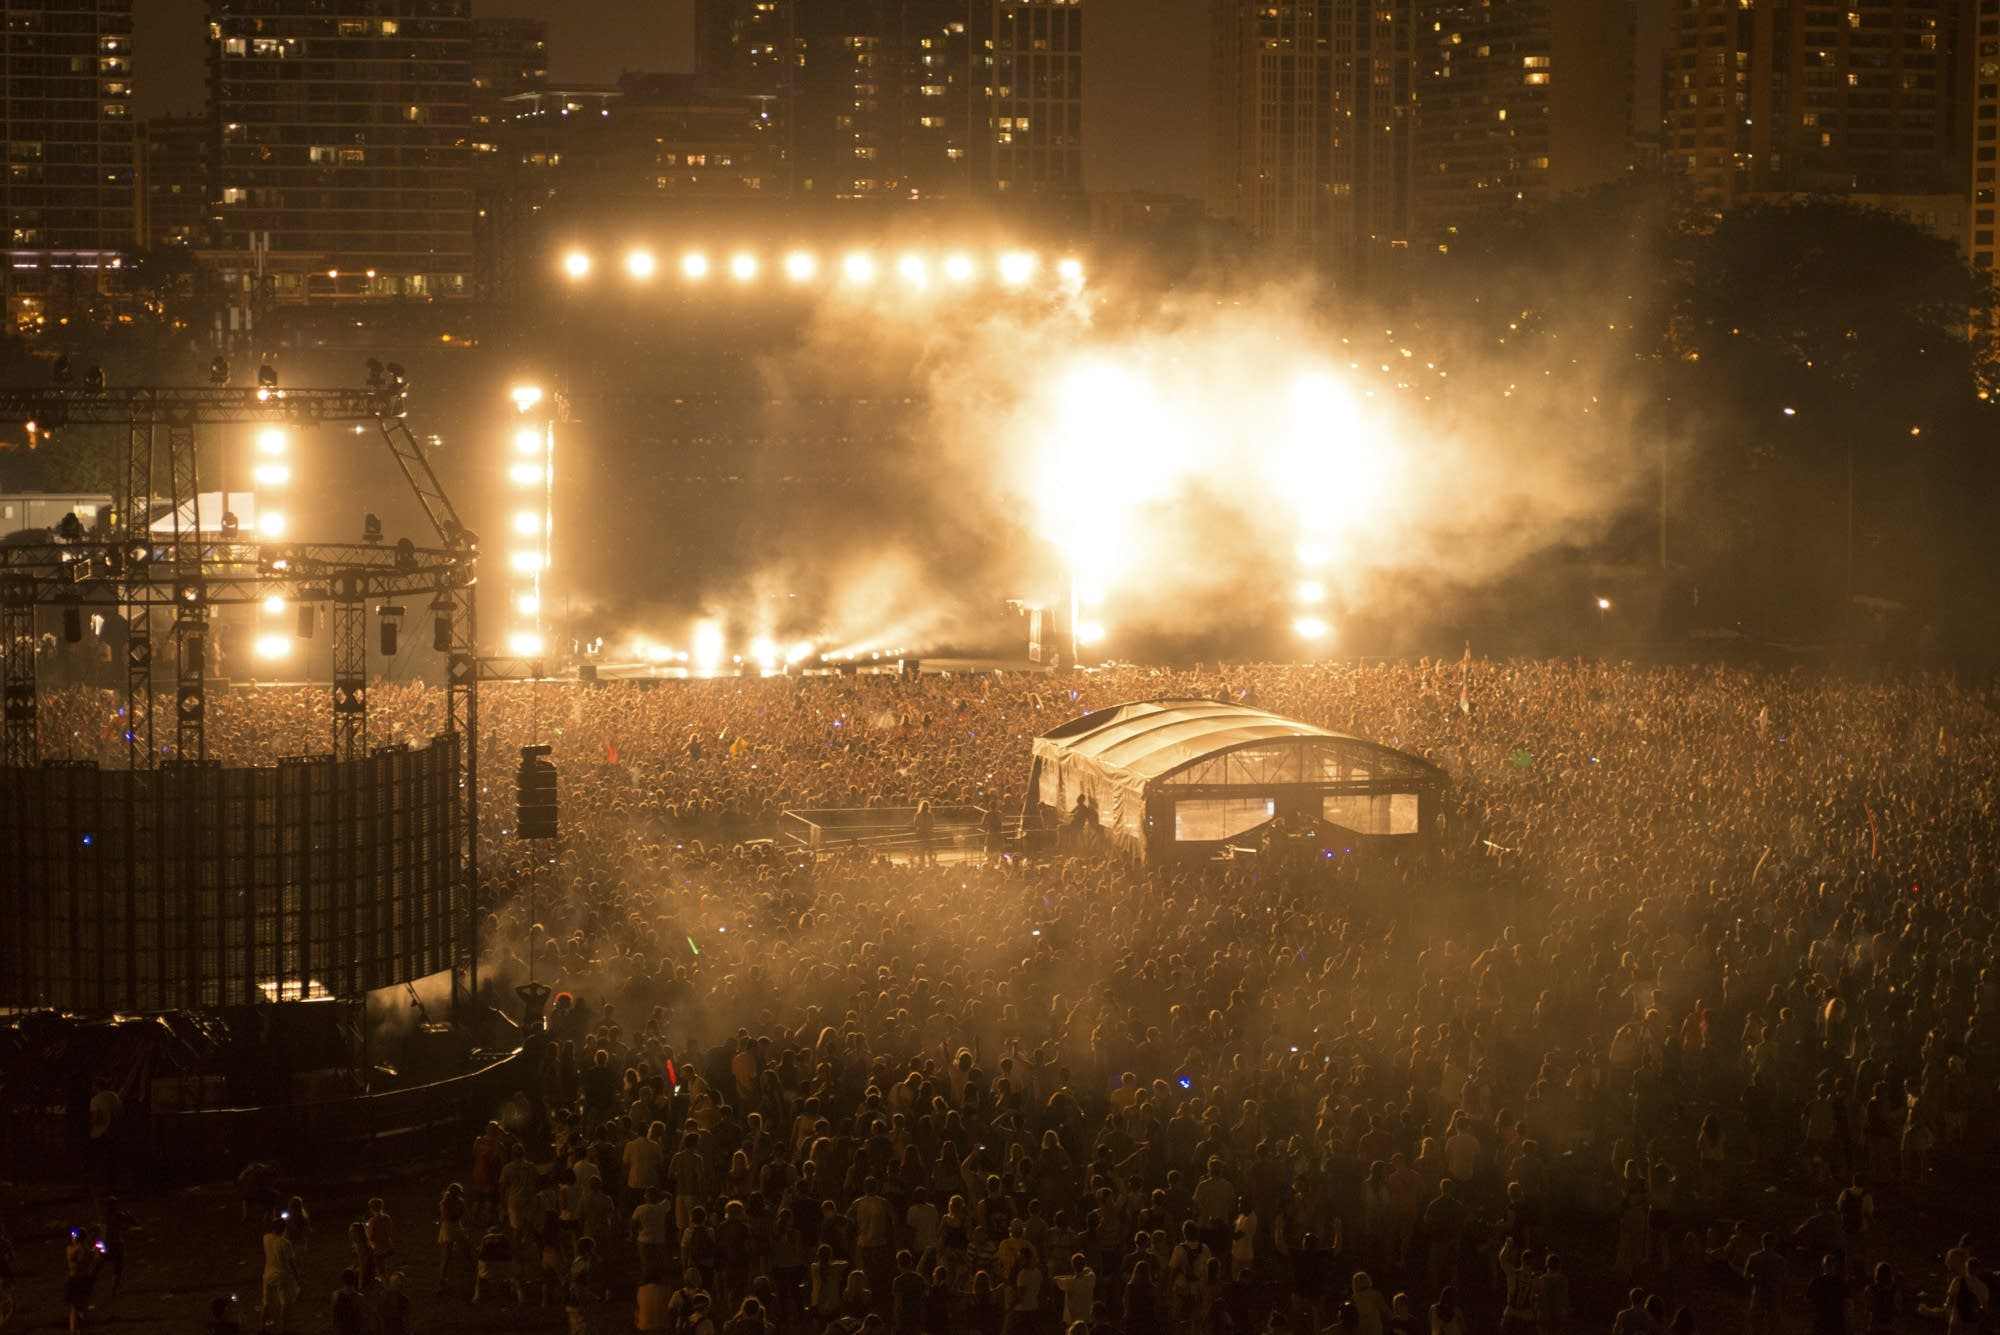 Lollapalooza August 3, 2013